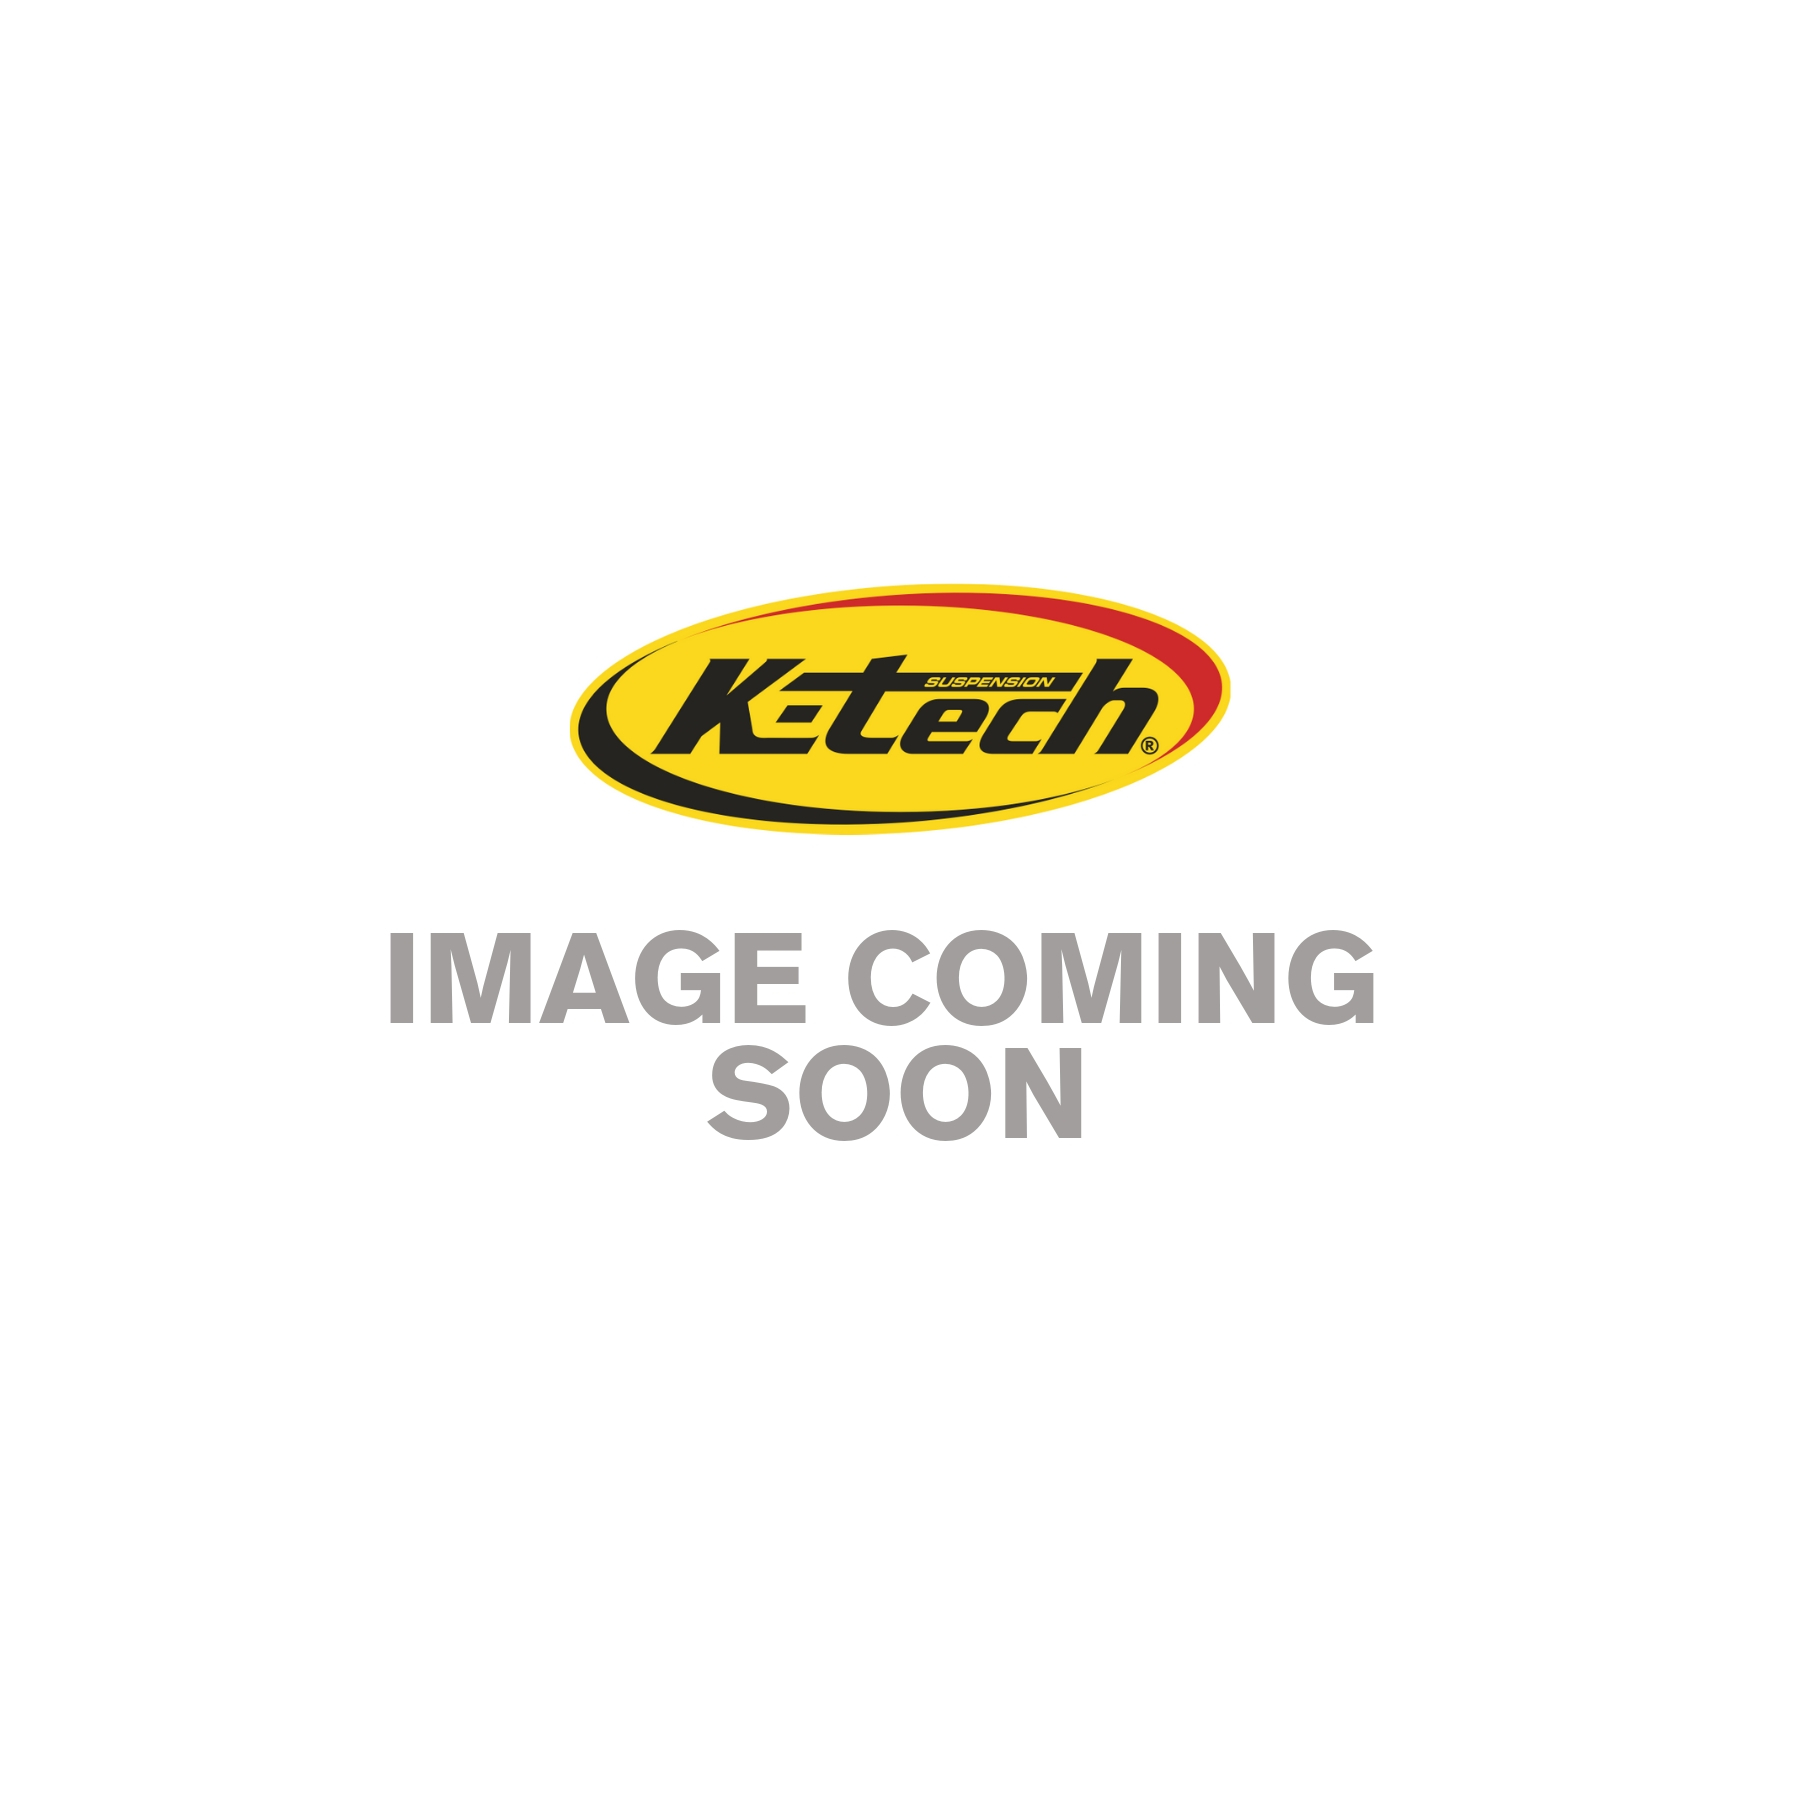 K-Tech Suspension  Vacuum Filling Machine (240v)